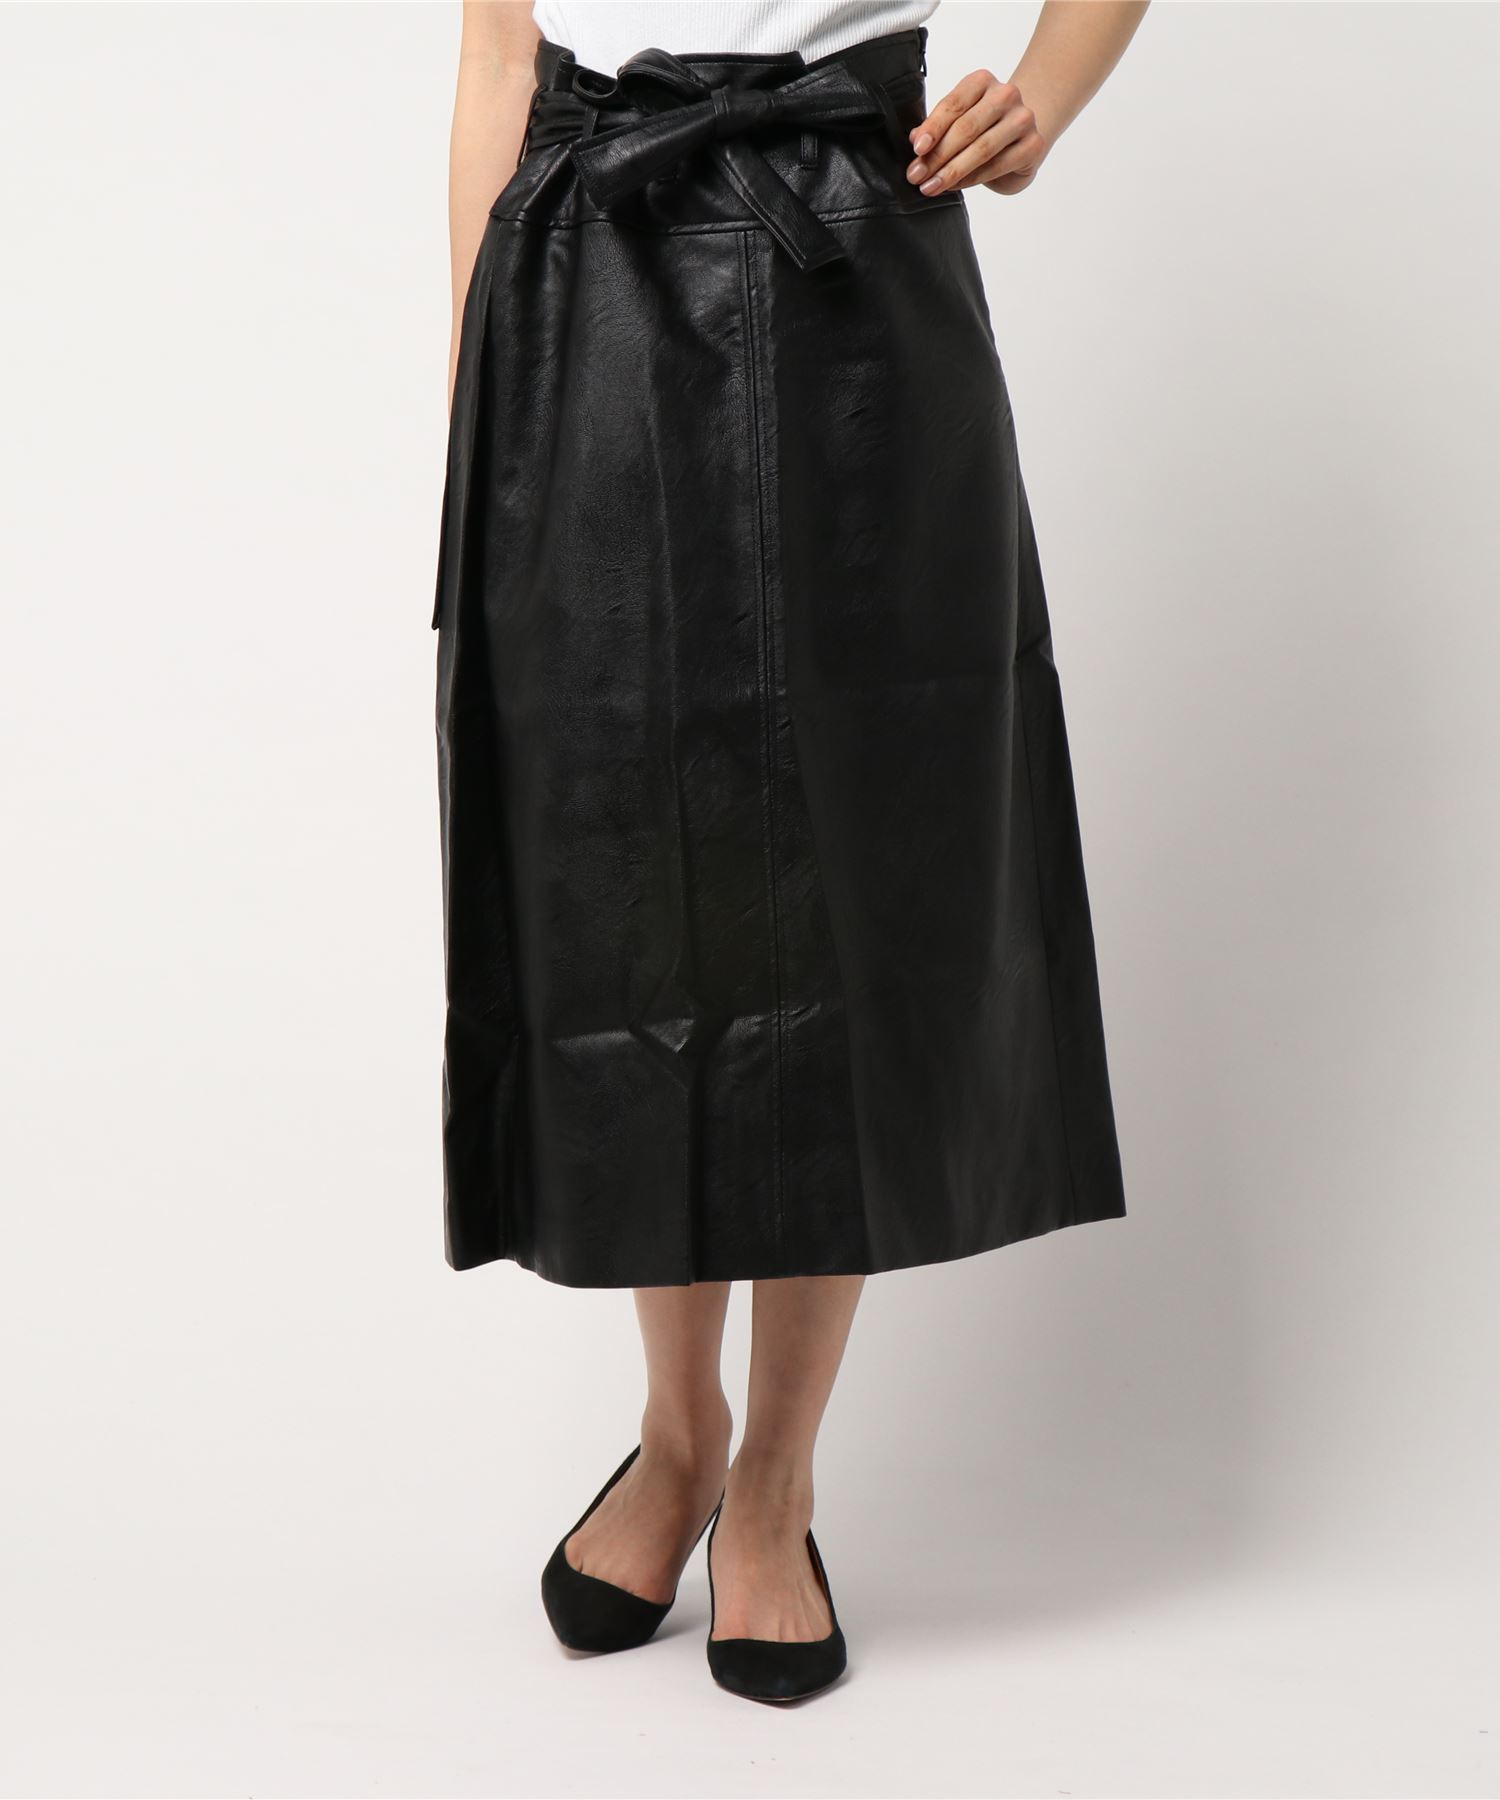 【No.6】Fiels Skirt Black Faux Leather